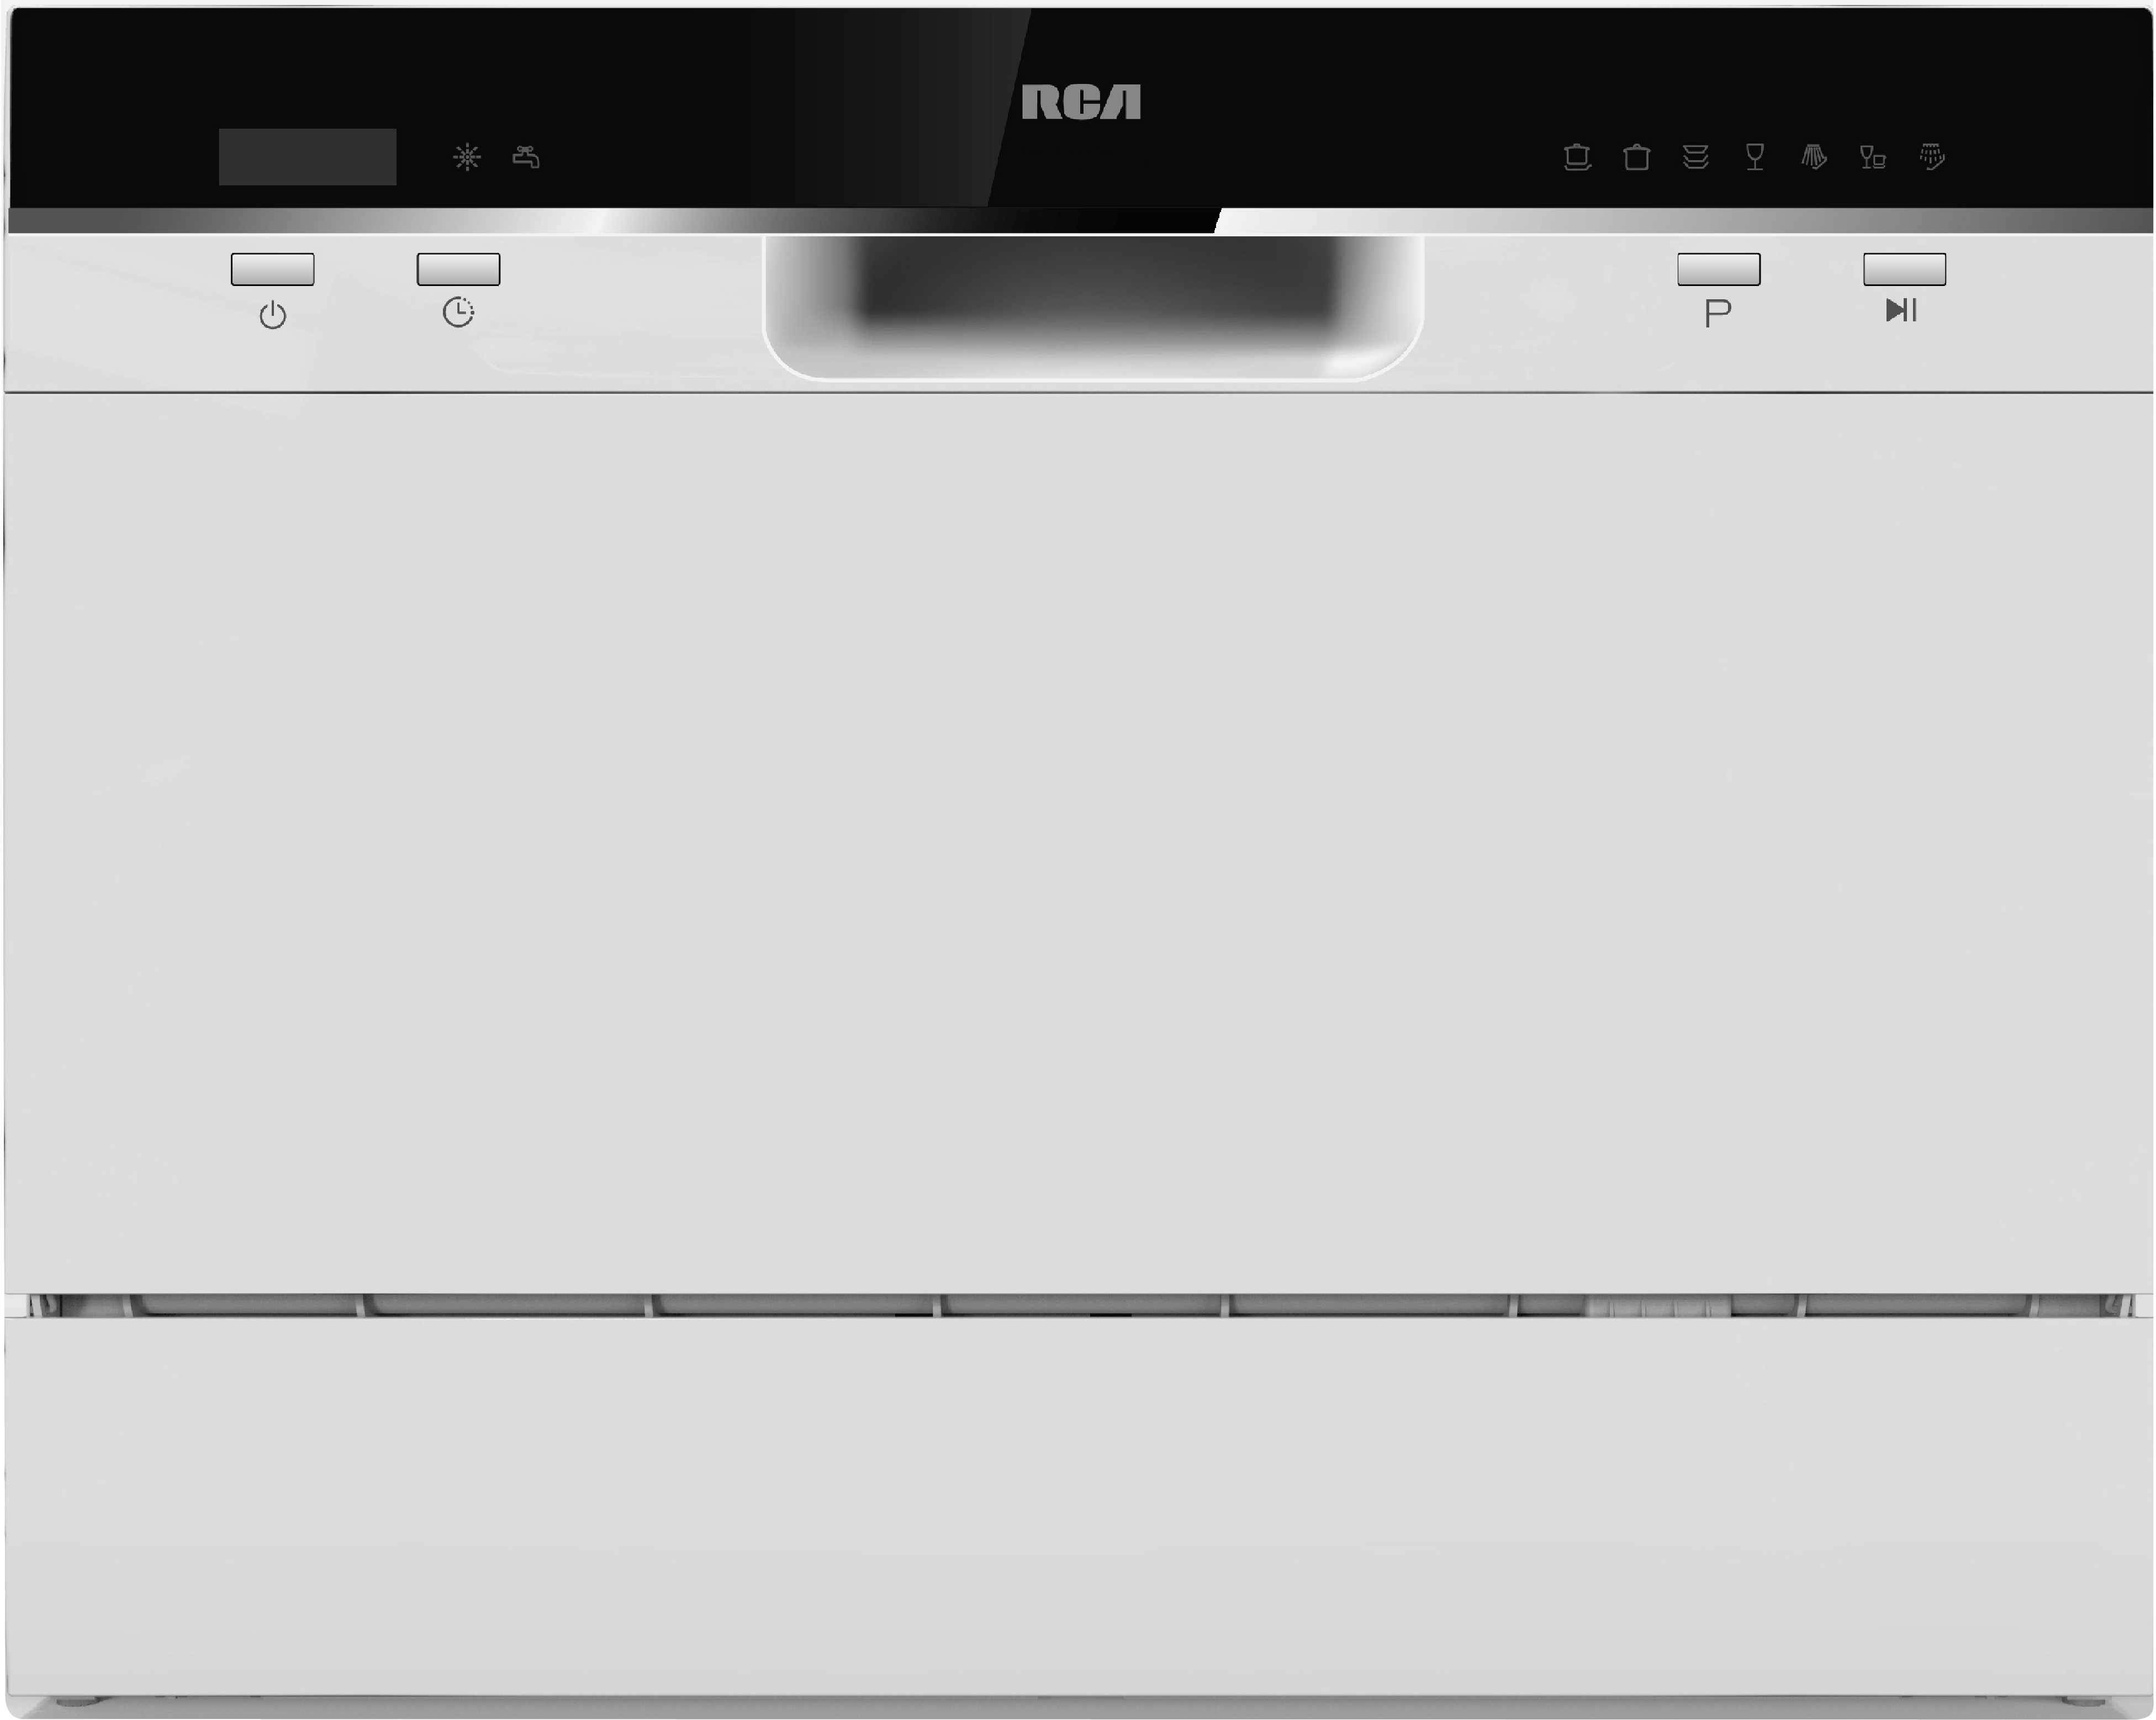 rca-countertop-dishwasher-white-quiet